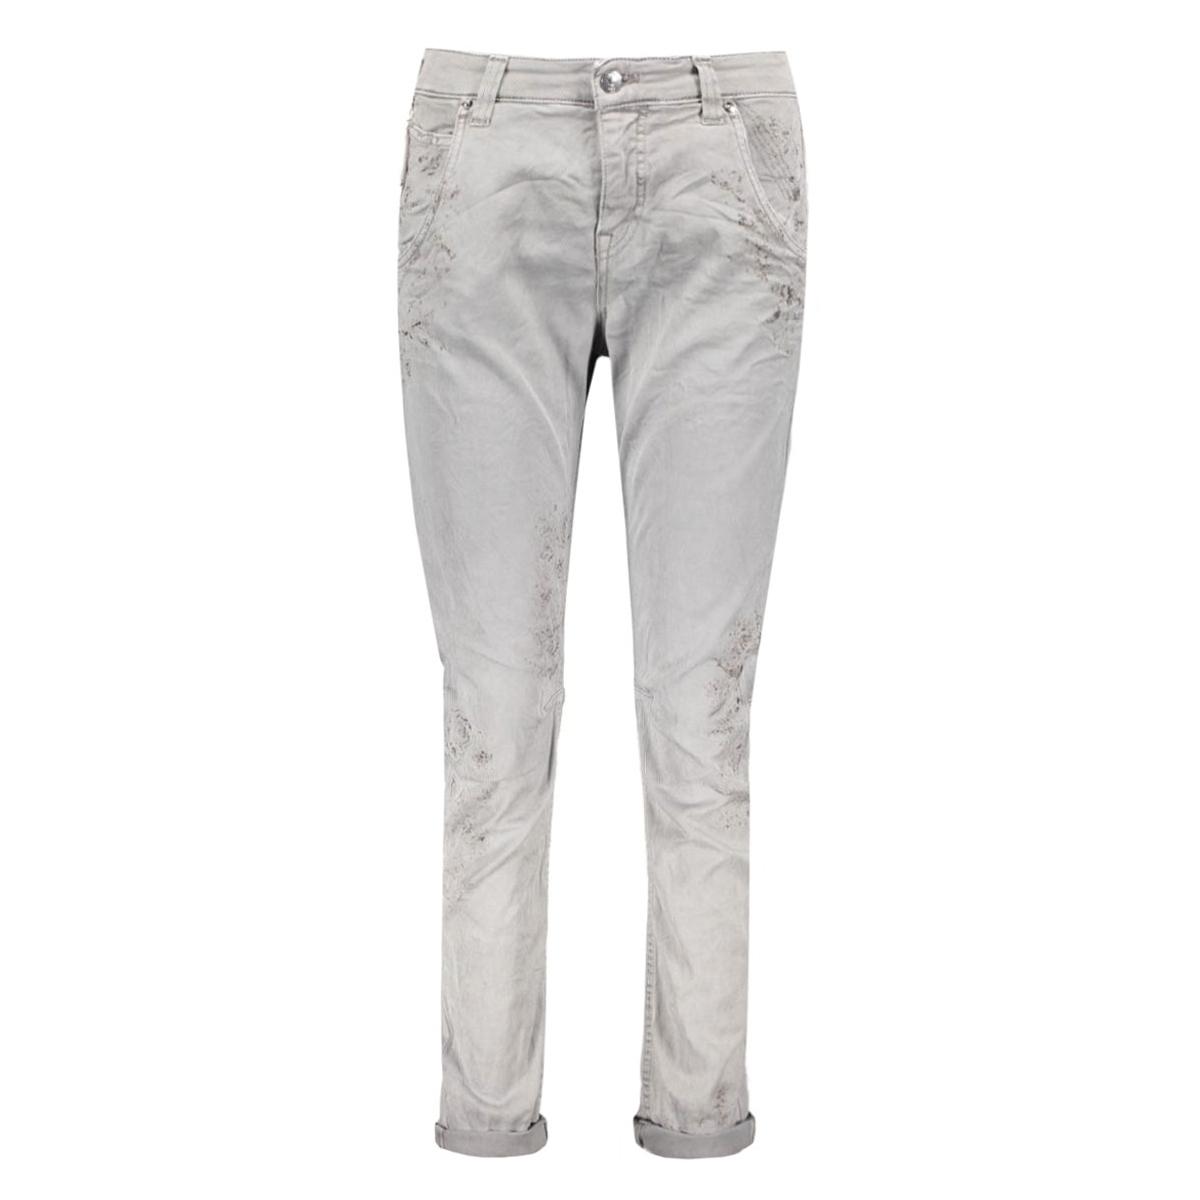 laxy 2393 00 0404 16 mac jeans grey